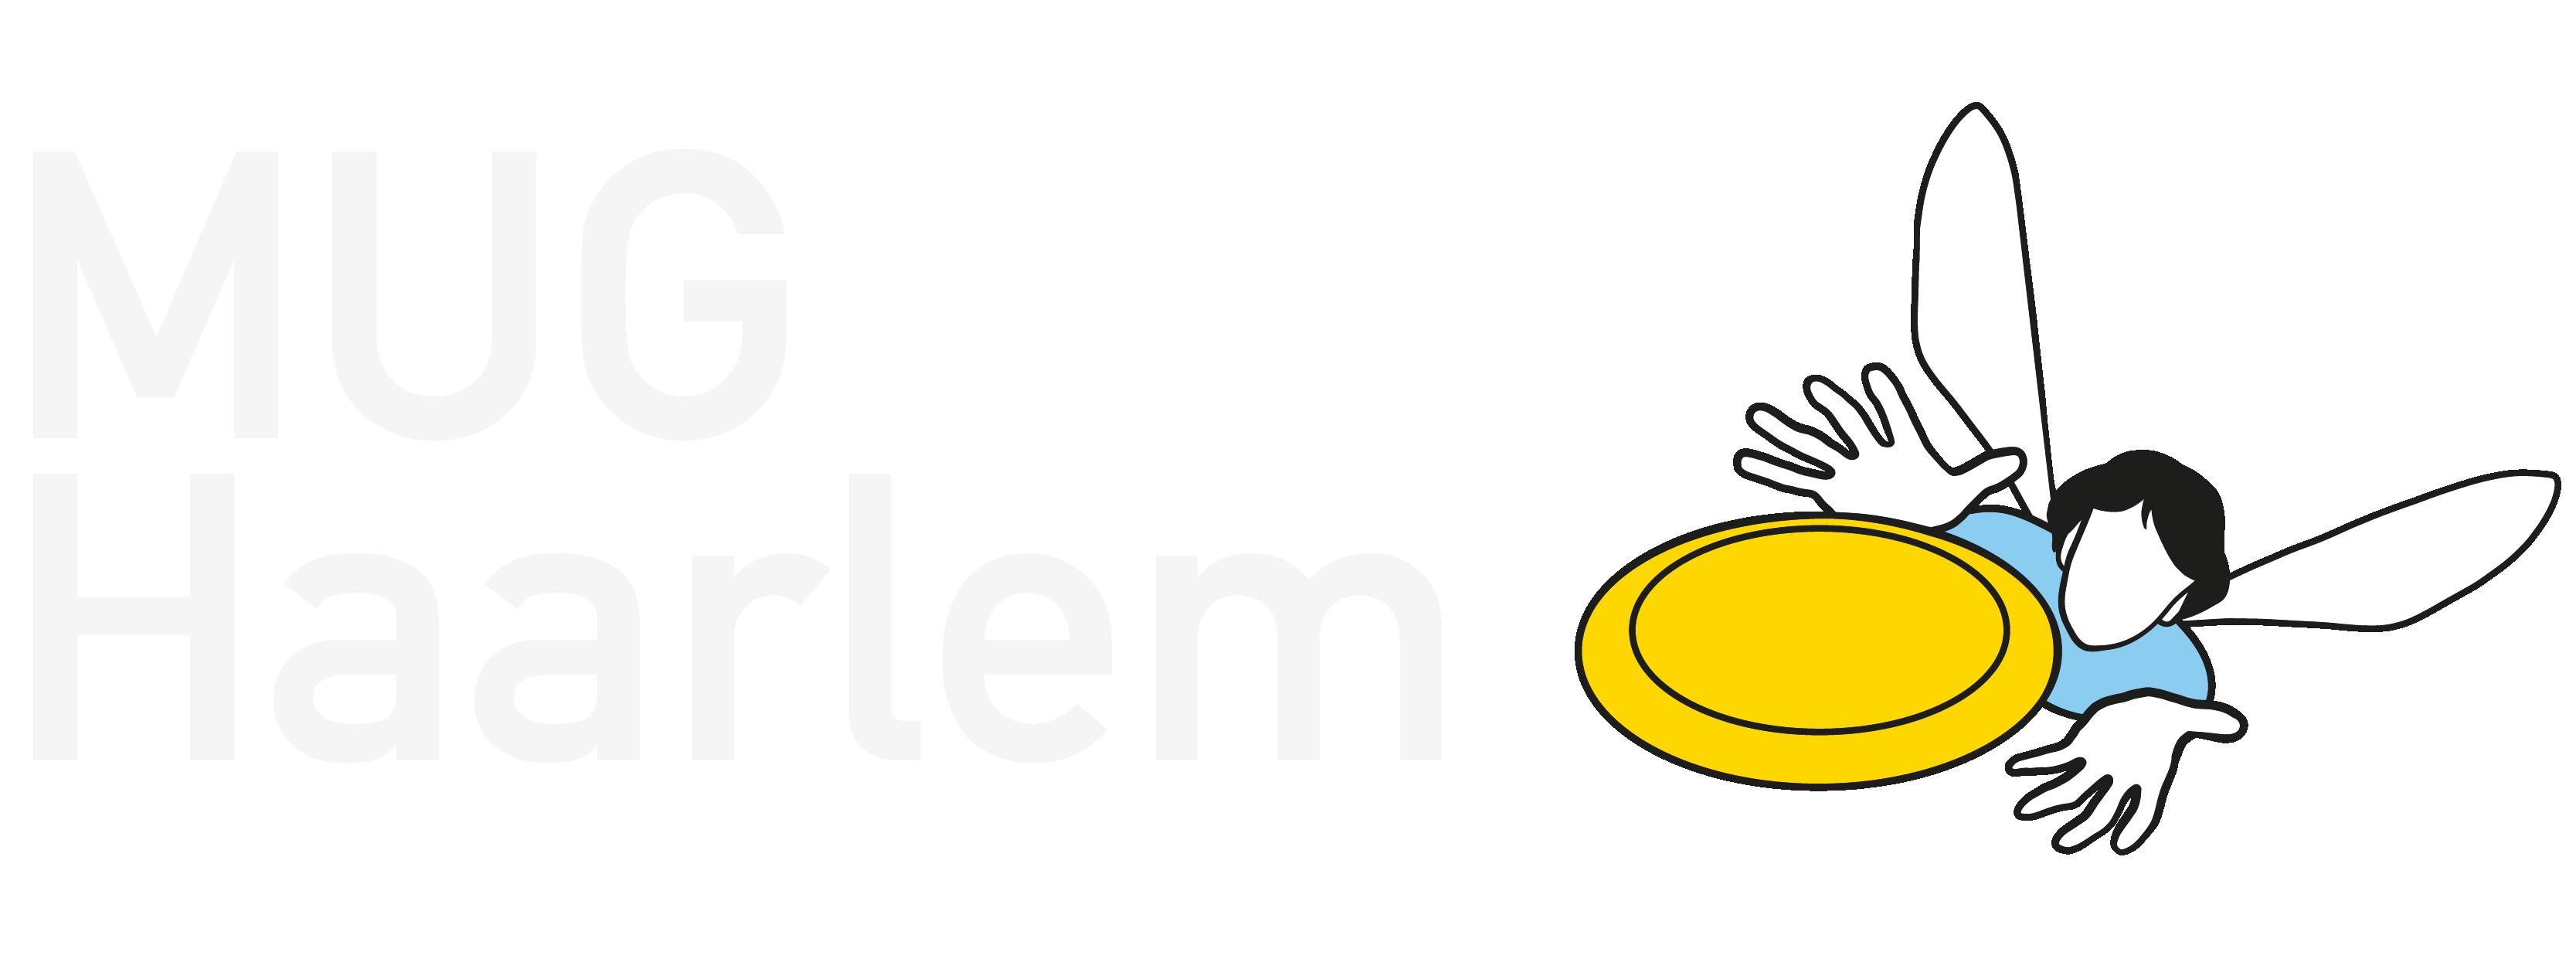 Haarlemse Ultimate Frisbeevereniging MUG